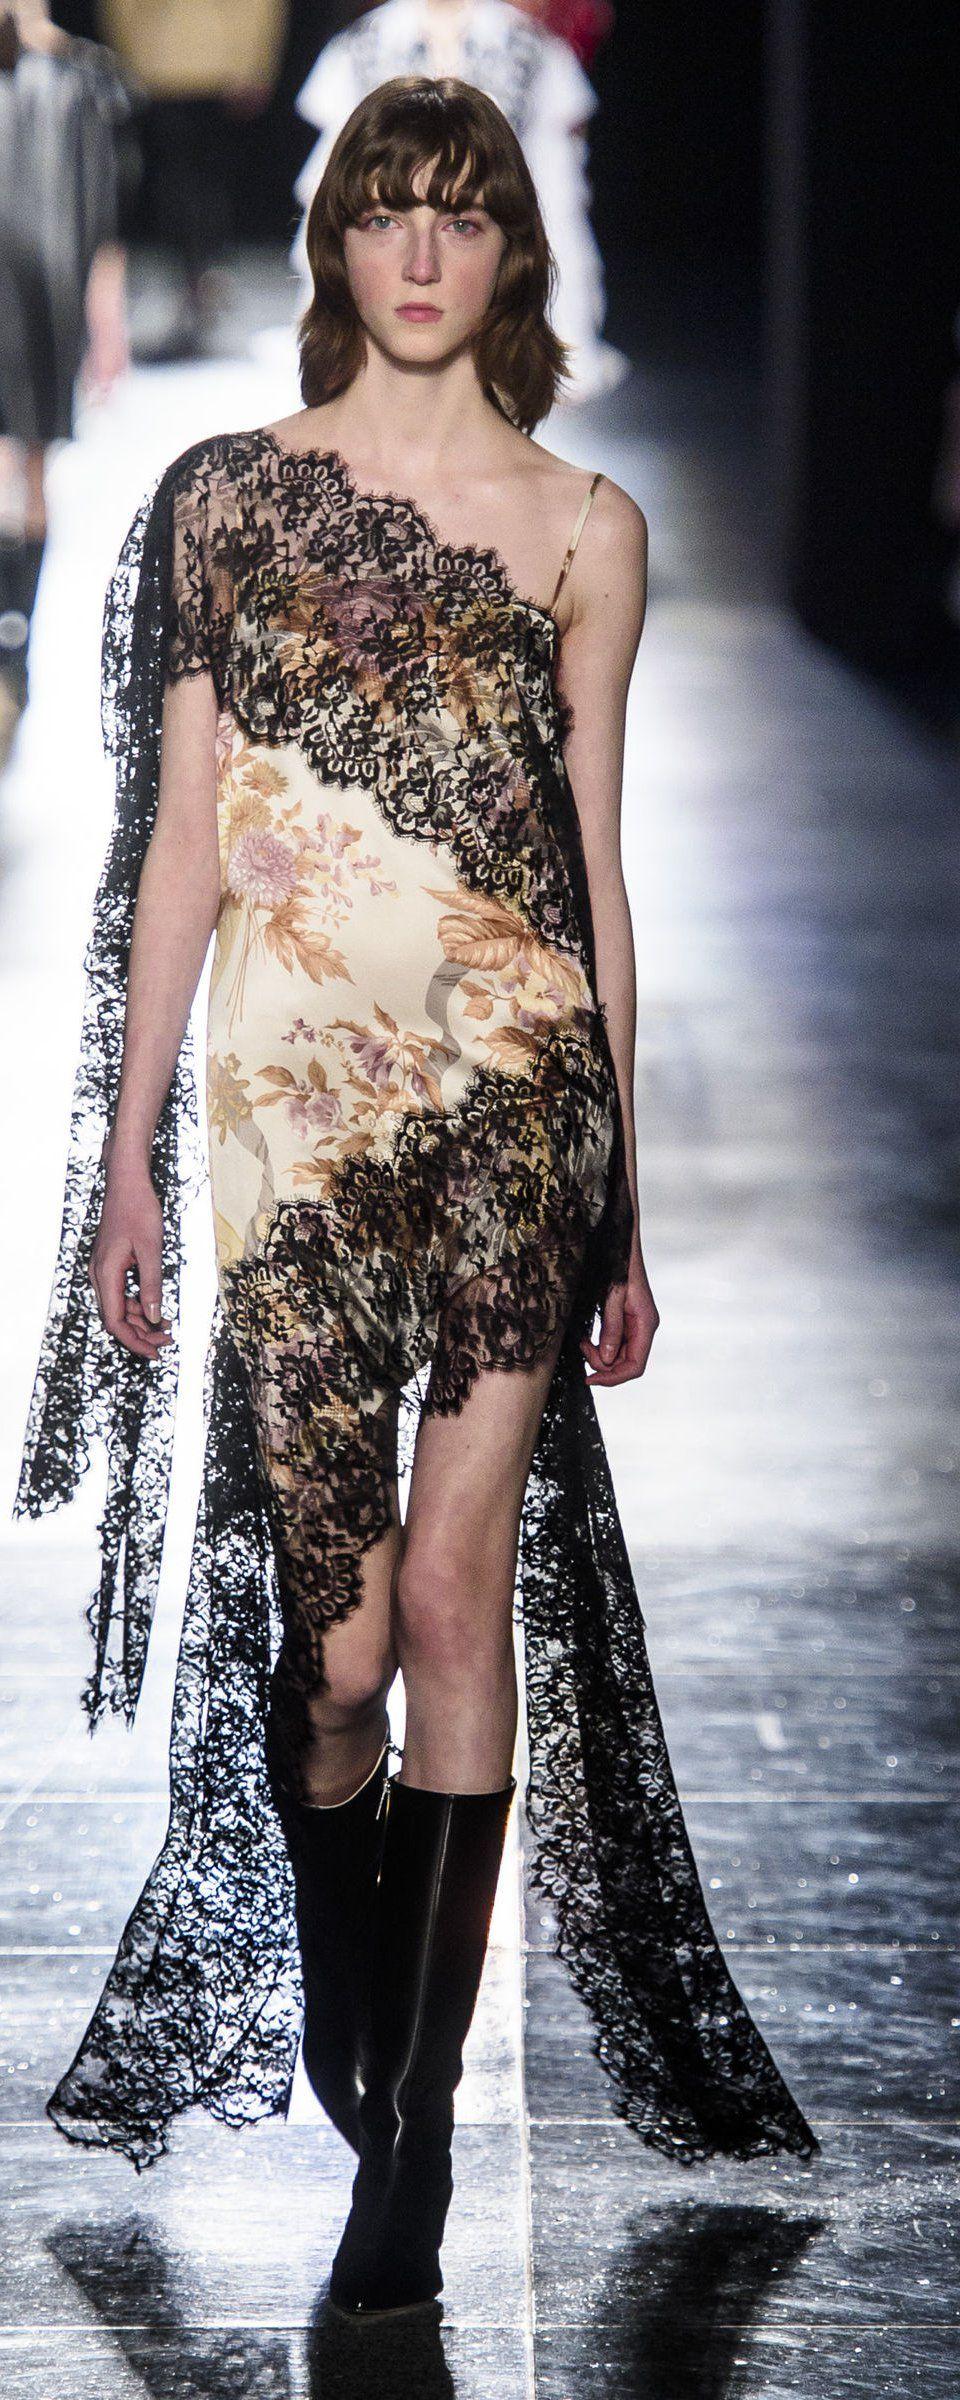 Lace dress with shorts underneath september 2019 Christopher Kane Fallwinter   ReadytoWear  Christopher